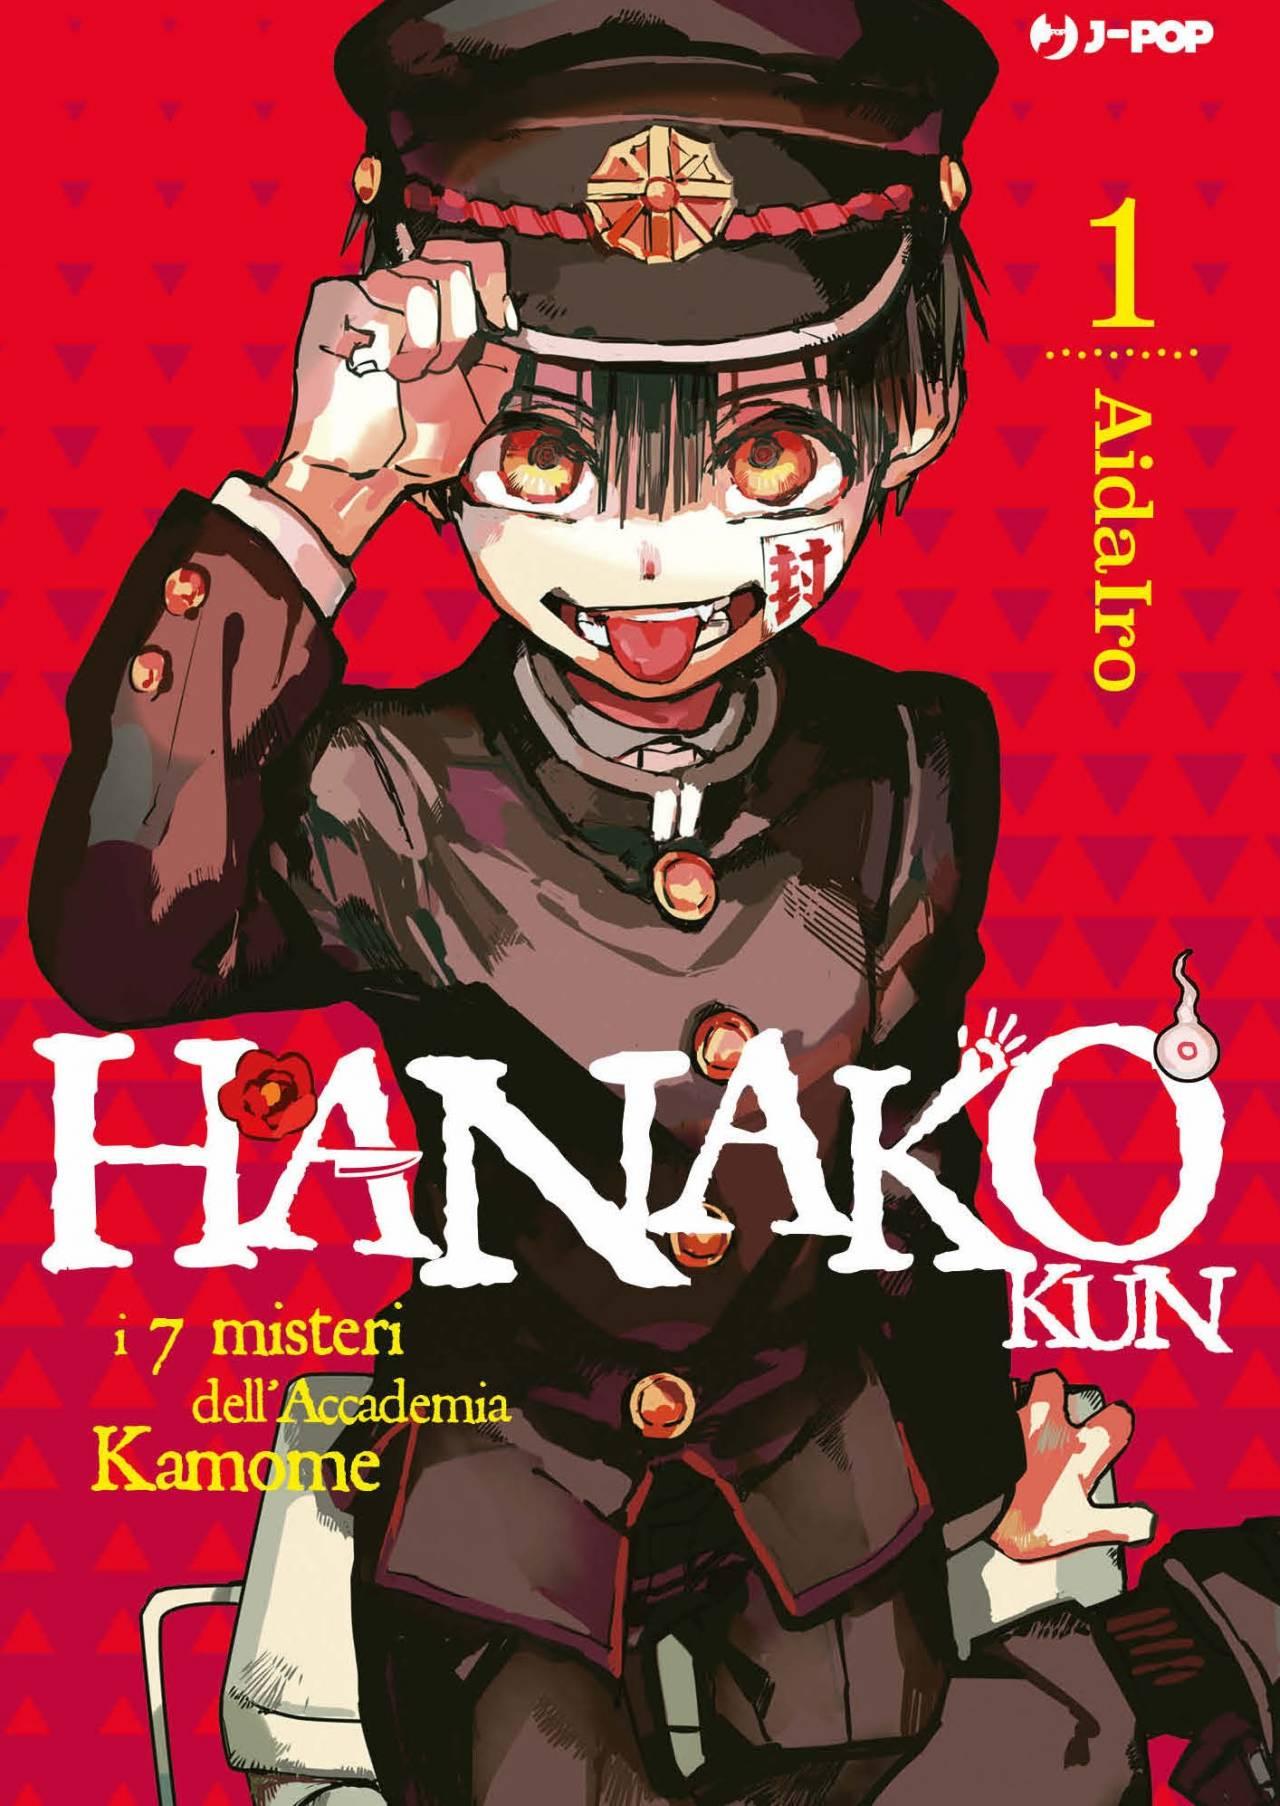 Le uscite J-POP Manga del 14 Ottobre 2020